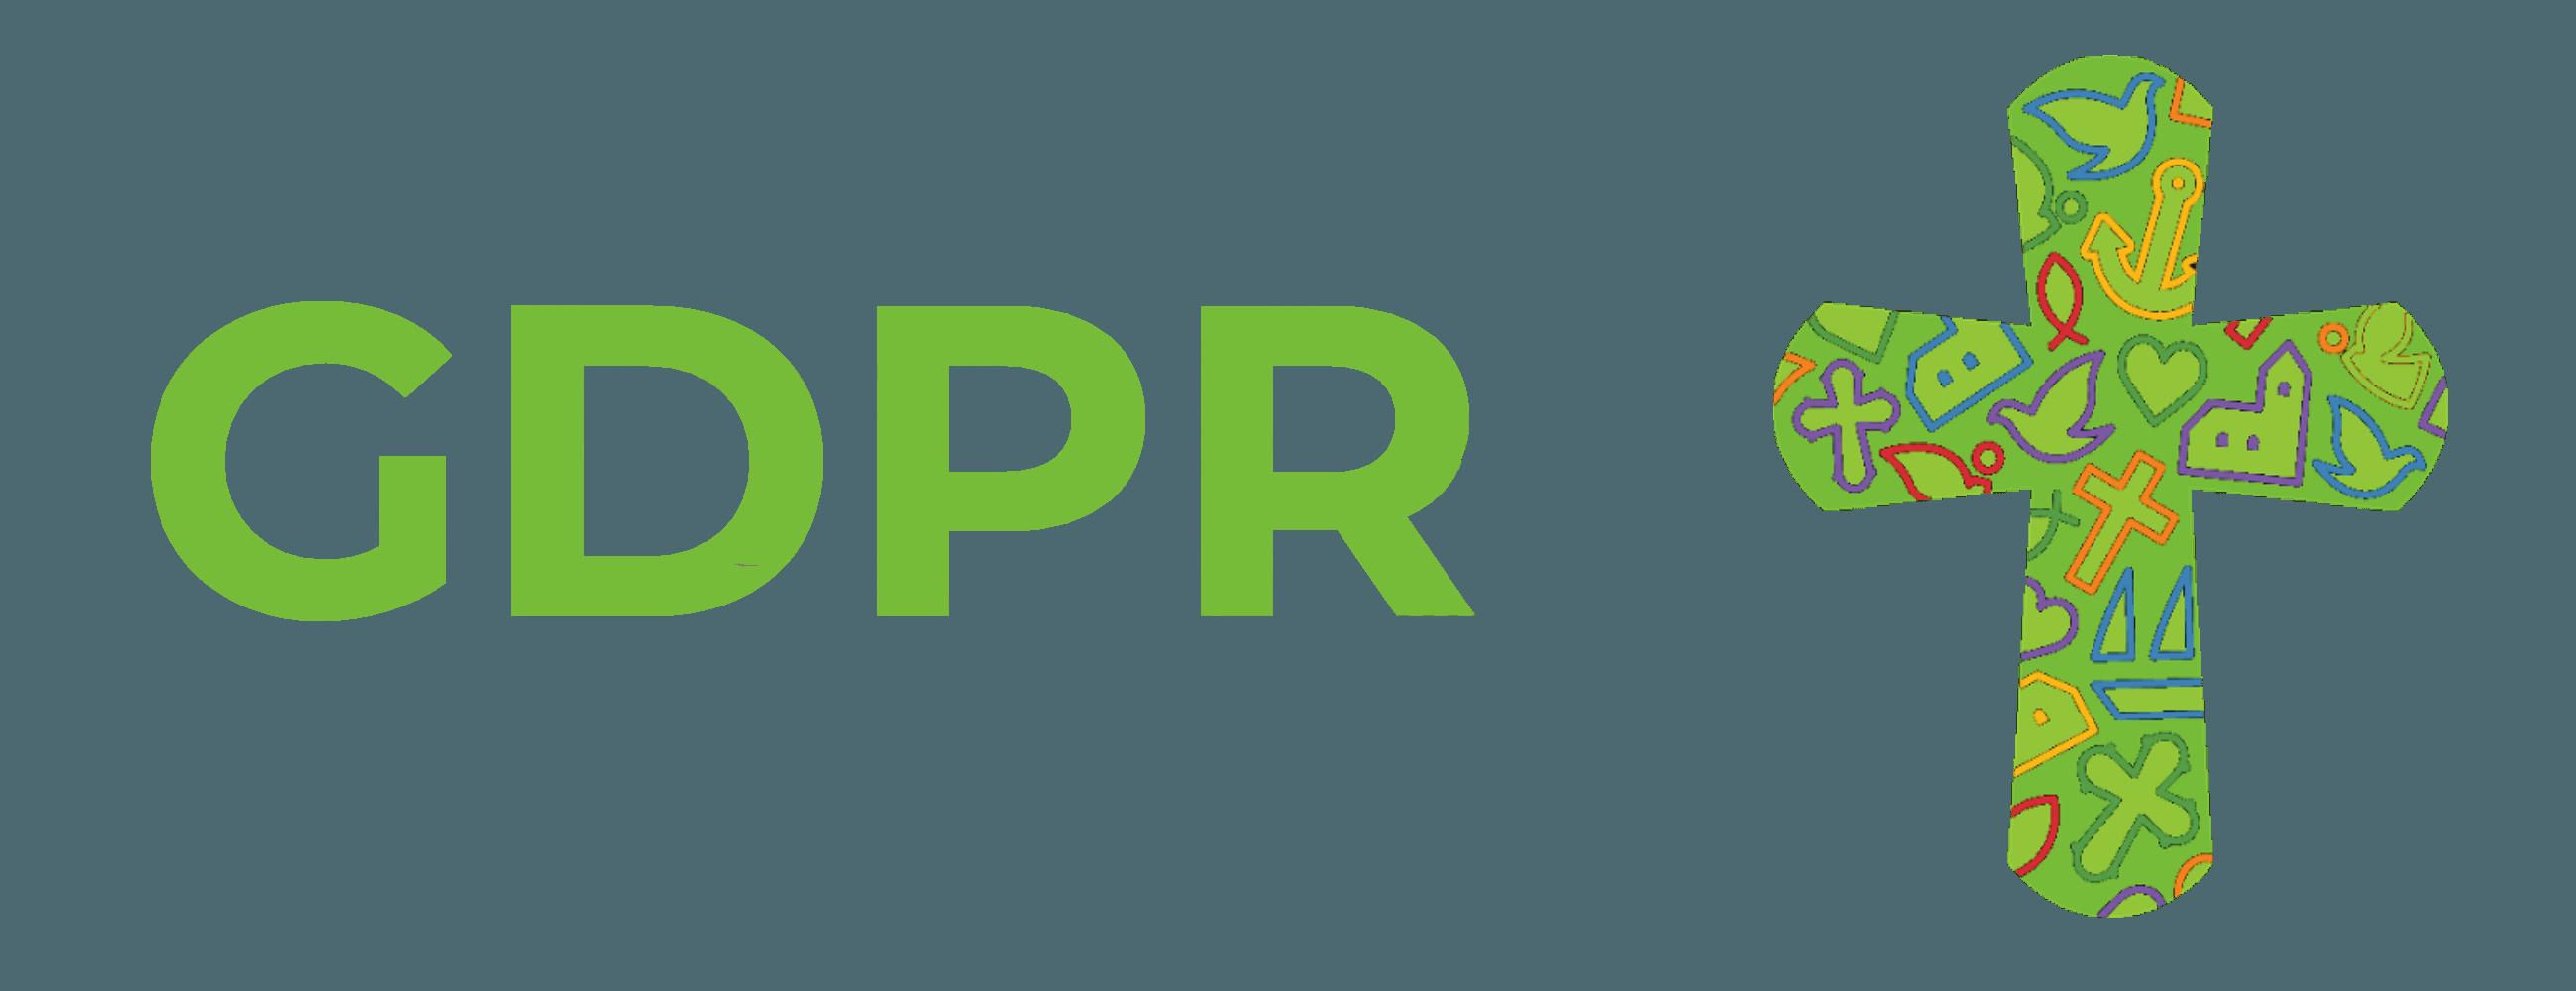 GDPR © Østrup Skeby Gerskov Kirker https://www.oestrup-skeby-gerskov-kirker.dk